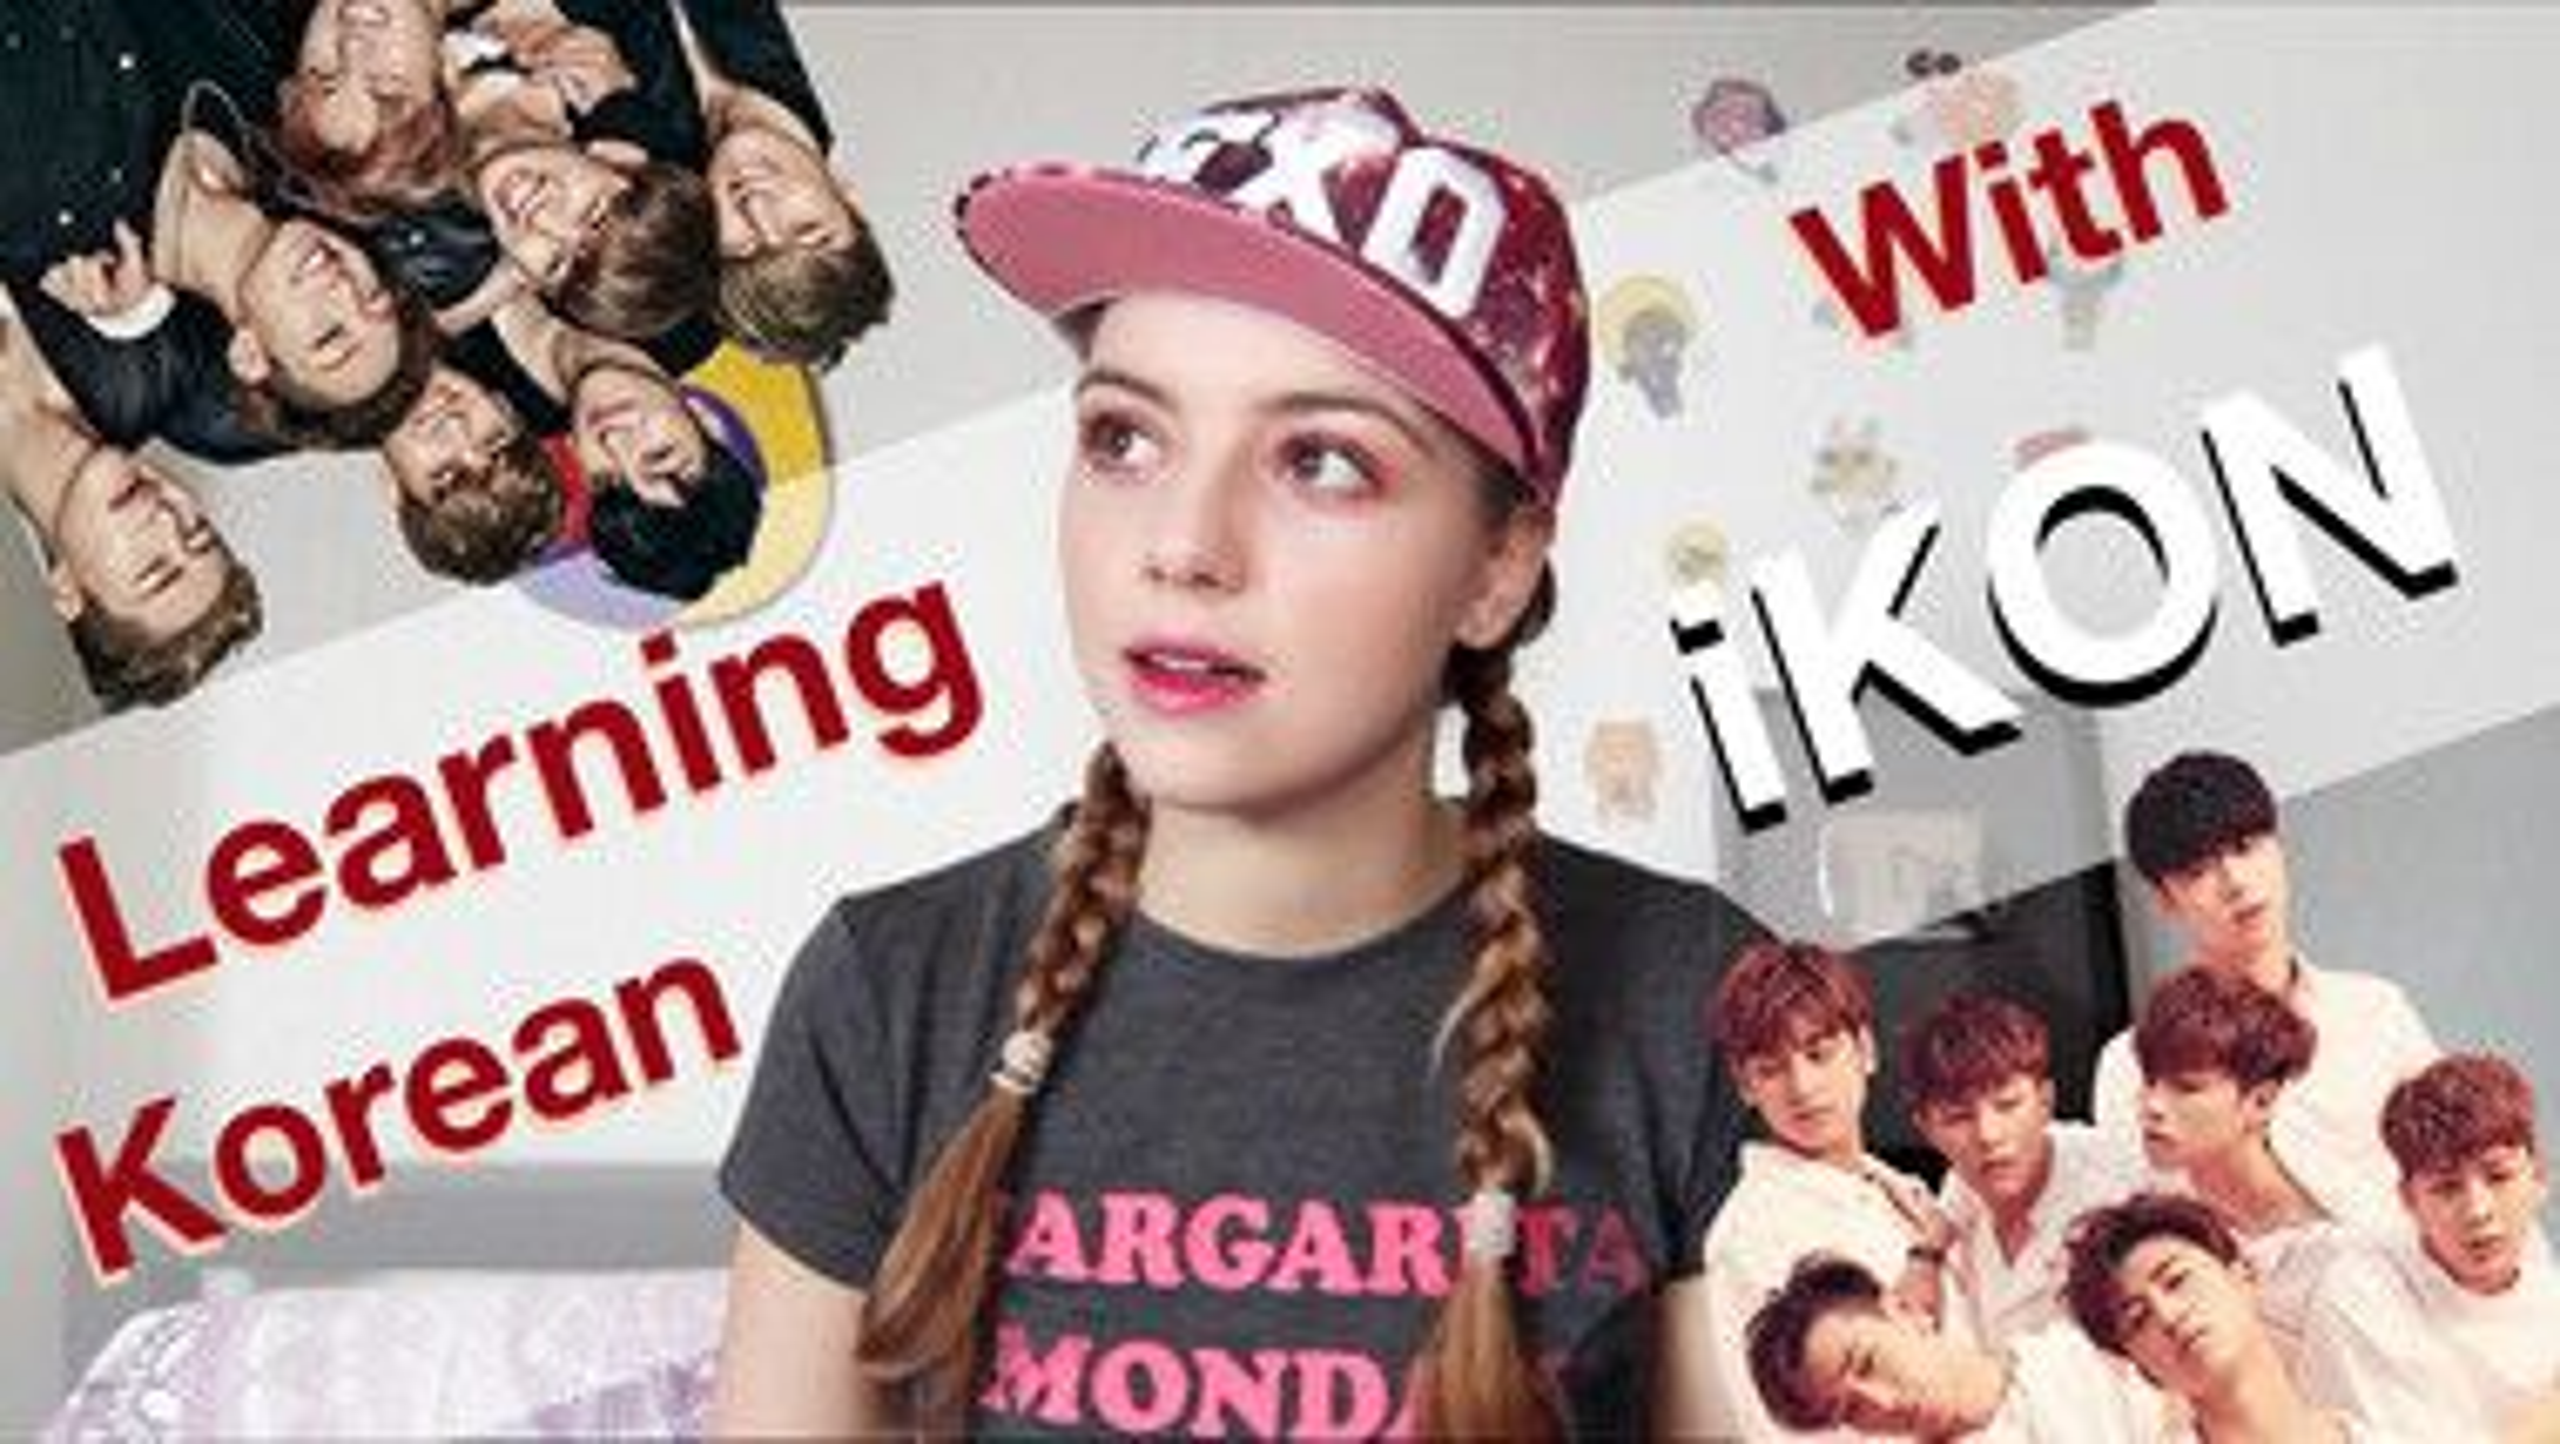 Margarita Episode 22: Learn Korean with iKON's Love Scenario!